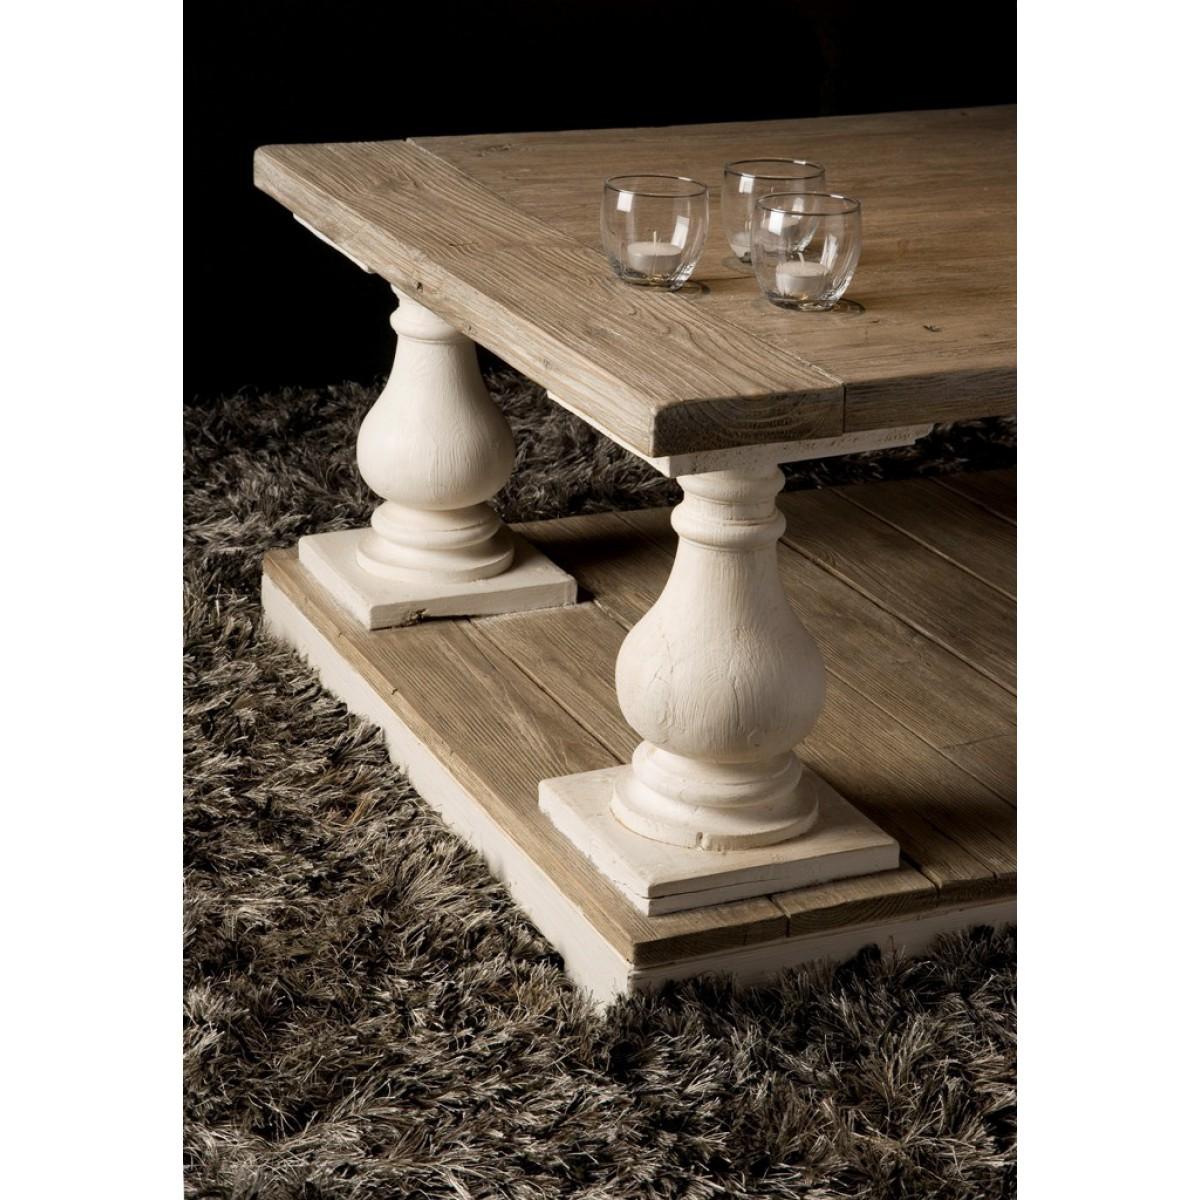 monza-prgramma-old-pine-tafel-kolompoot